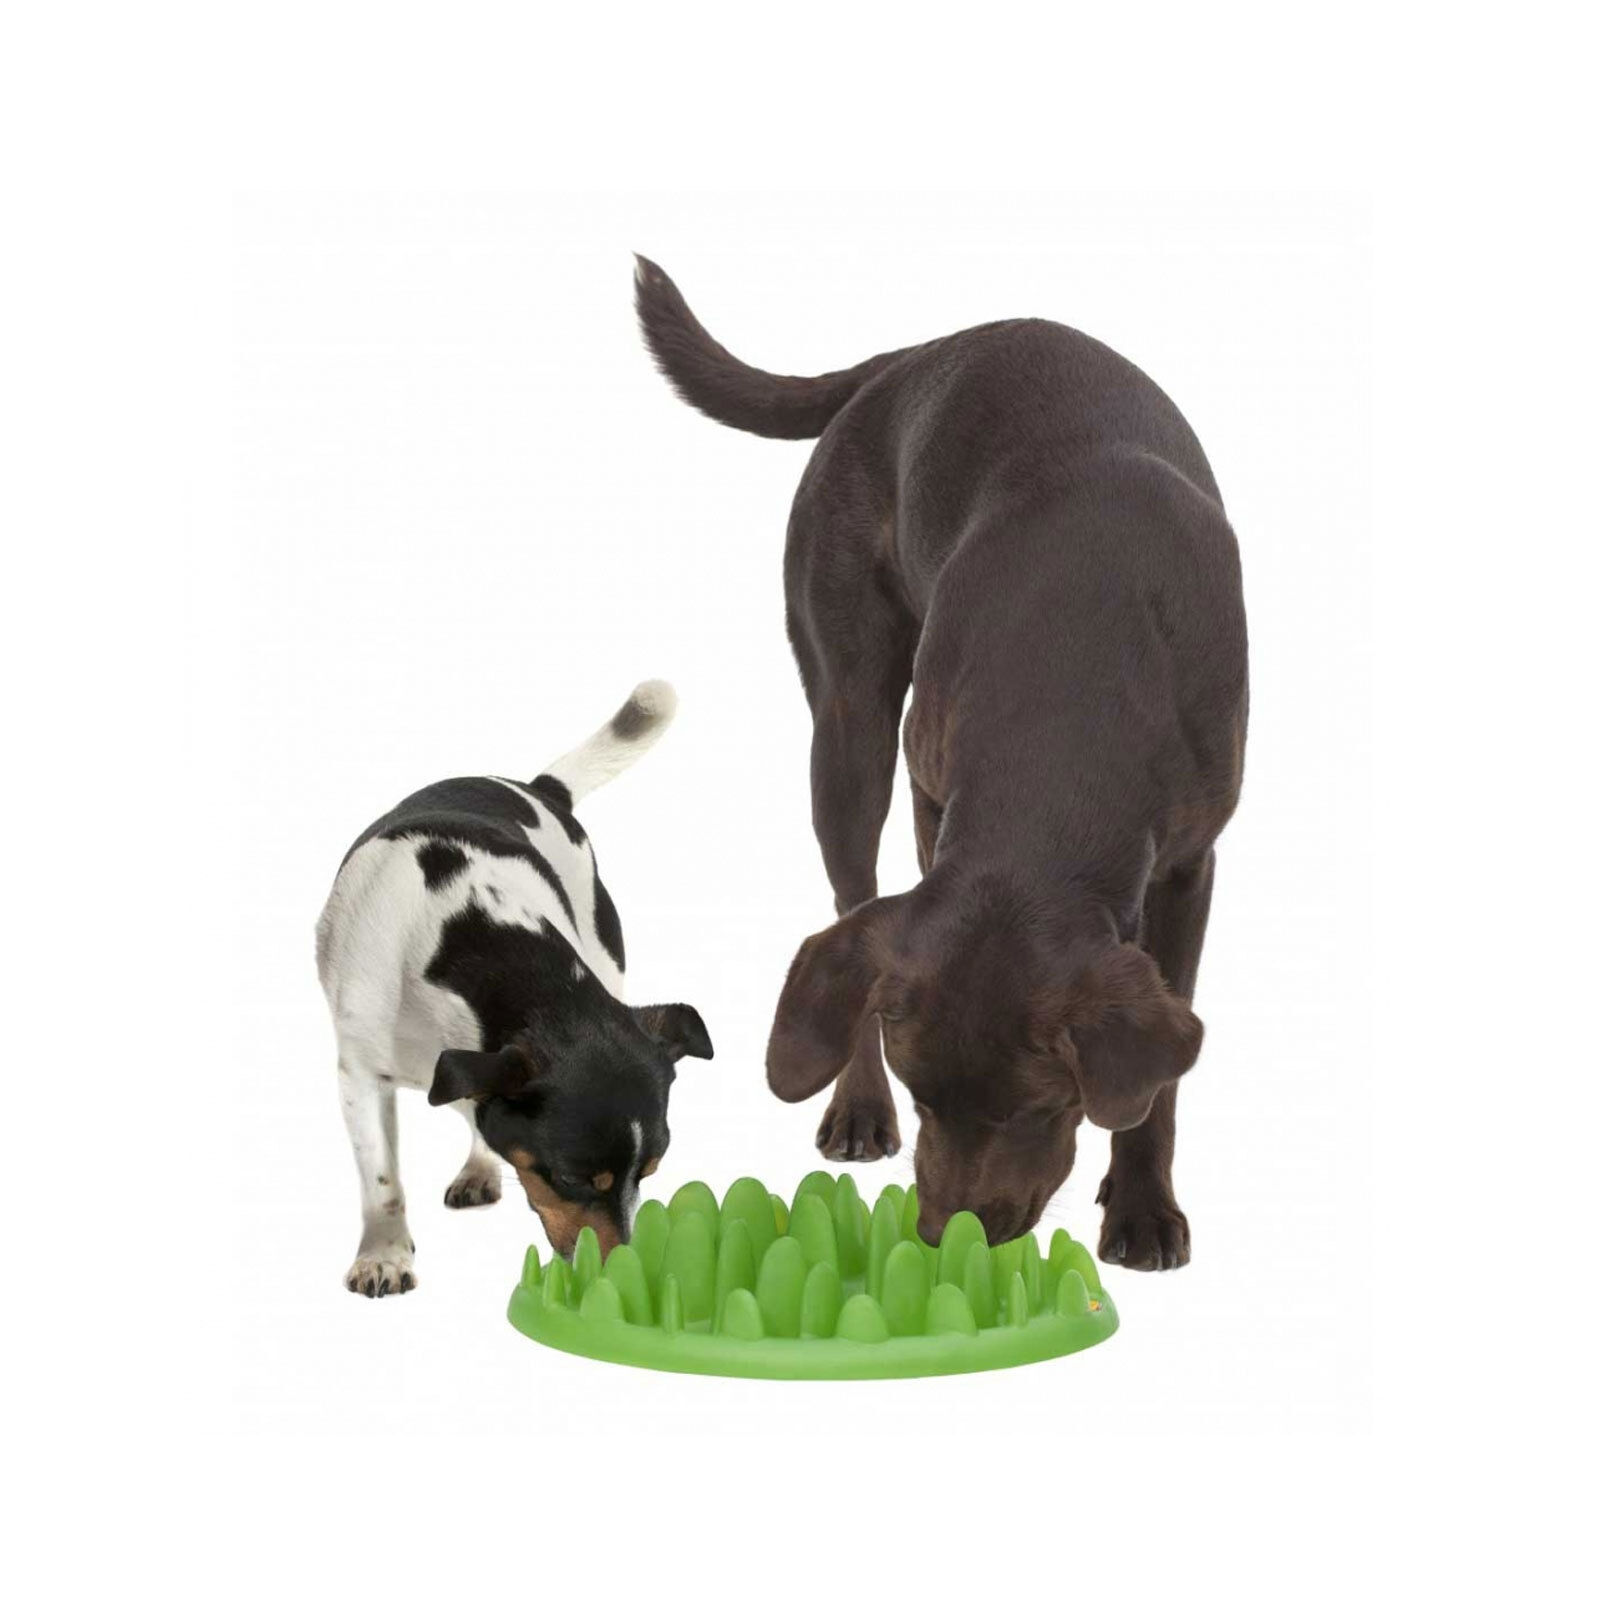 Green Interactive Slow Feeder Dog Puppy Cat Challenge Dishwasher Safe Food Bowl